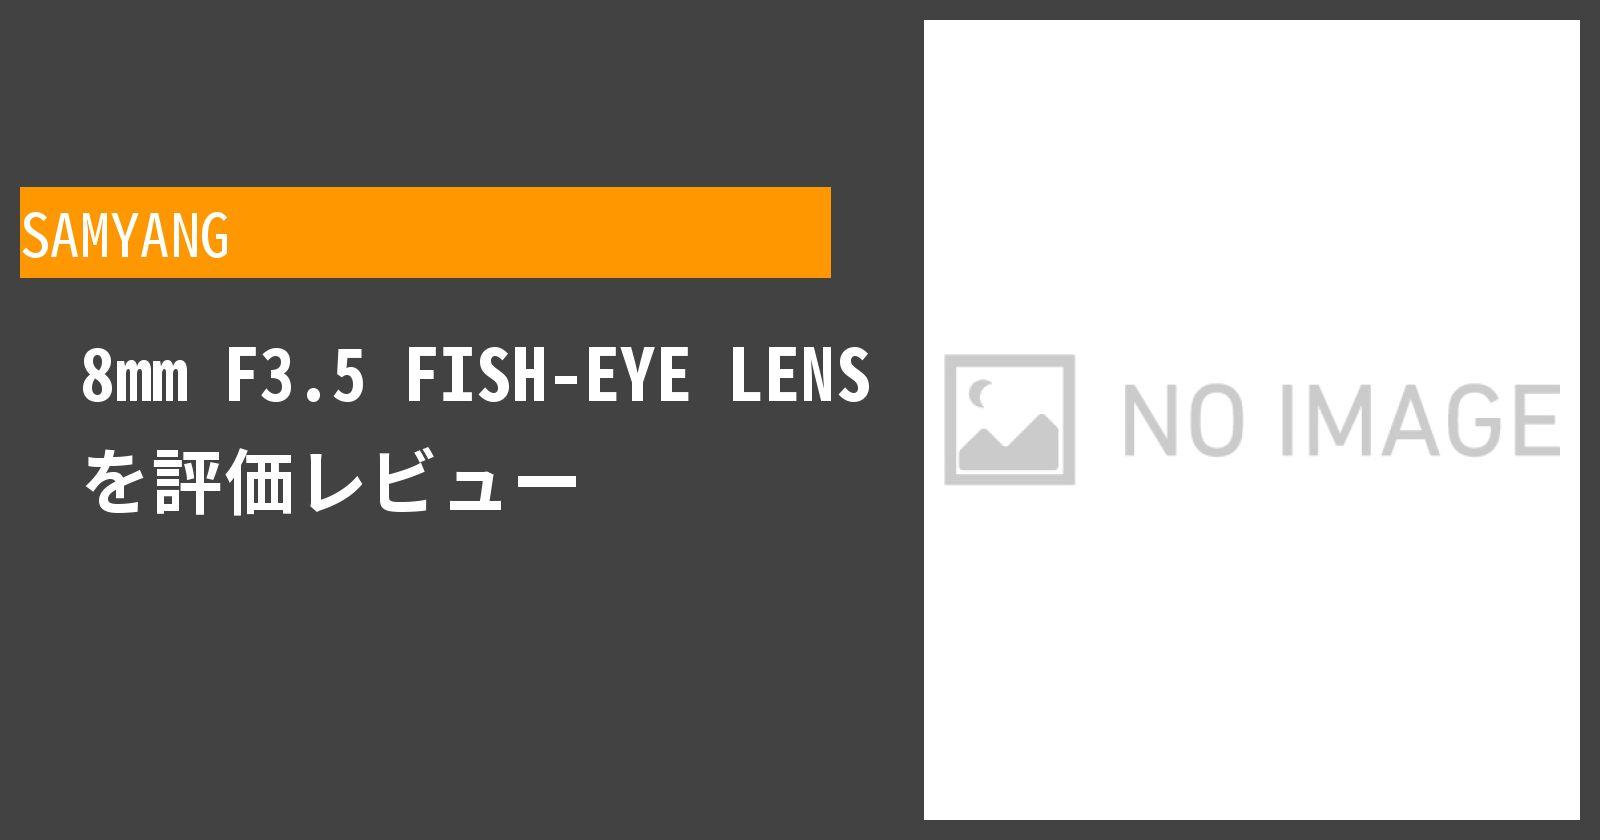 8mm F3.5 FISH-EYE LENSを徹底評価